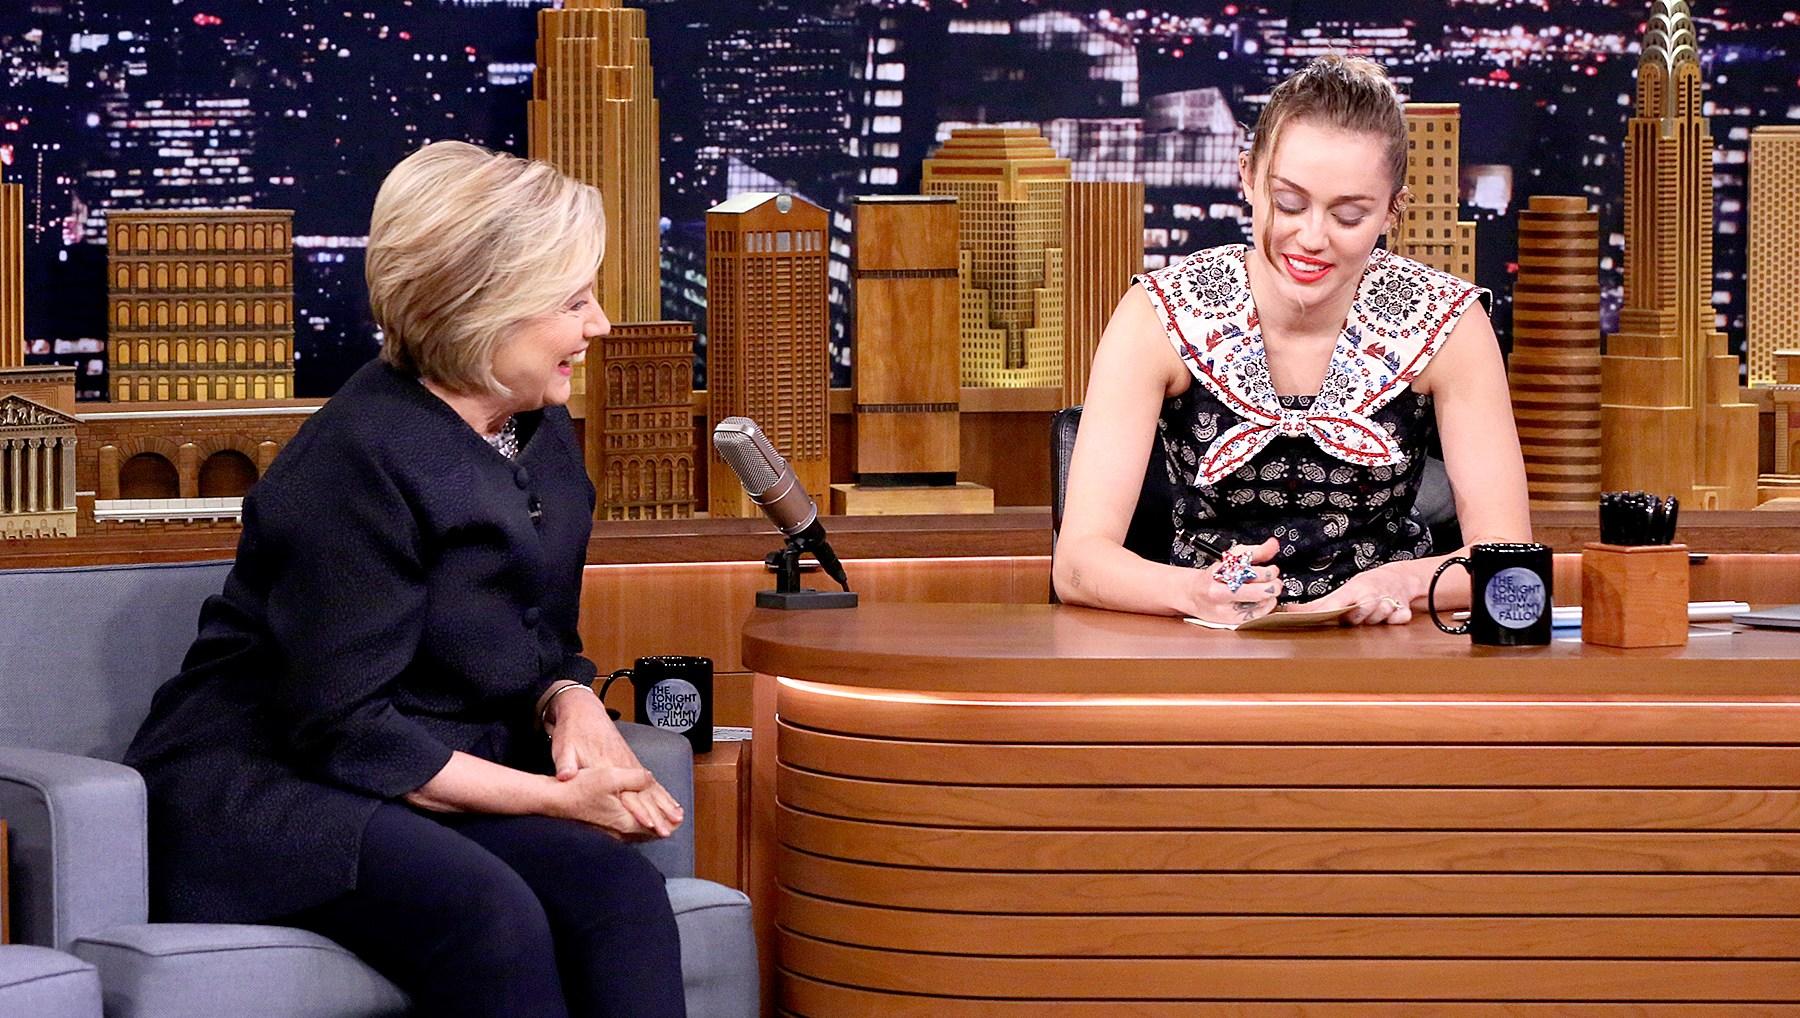 Hilary-Clinton-Miley-Cyrus